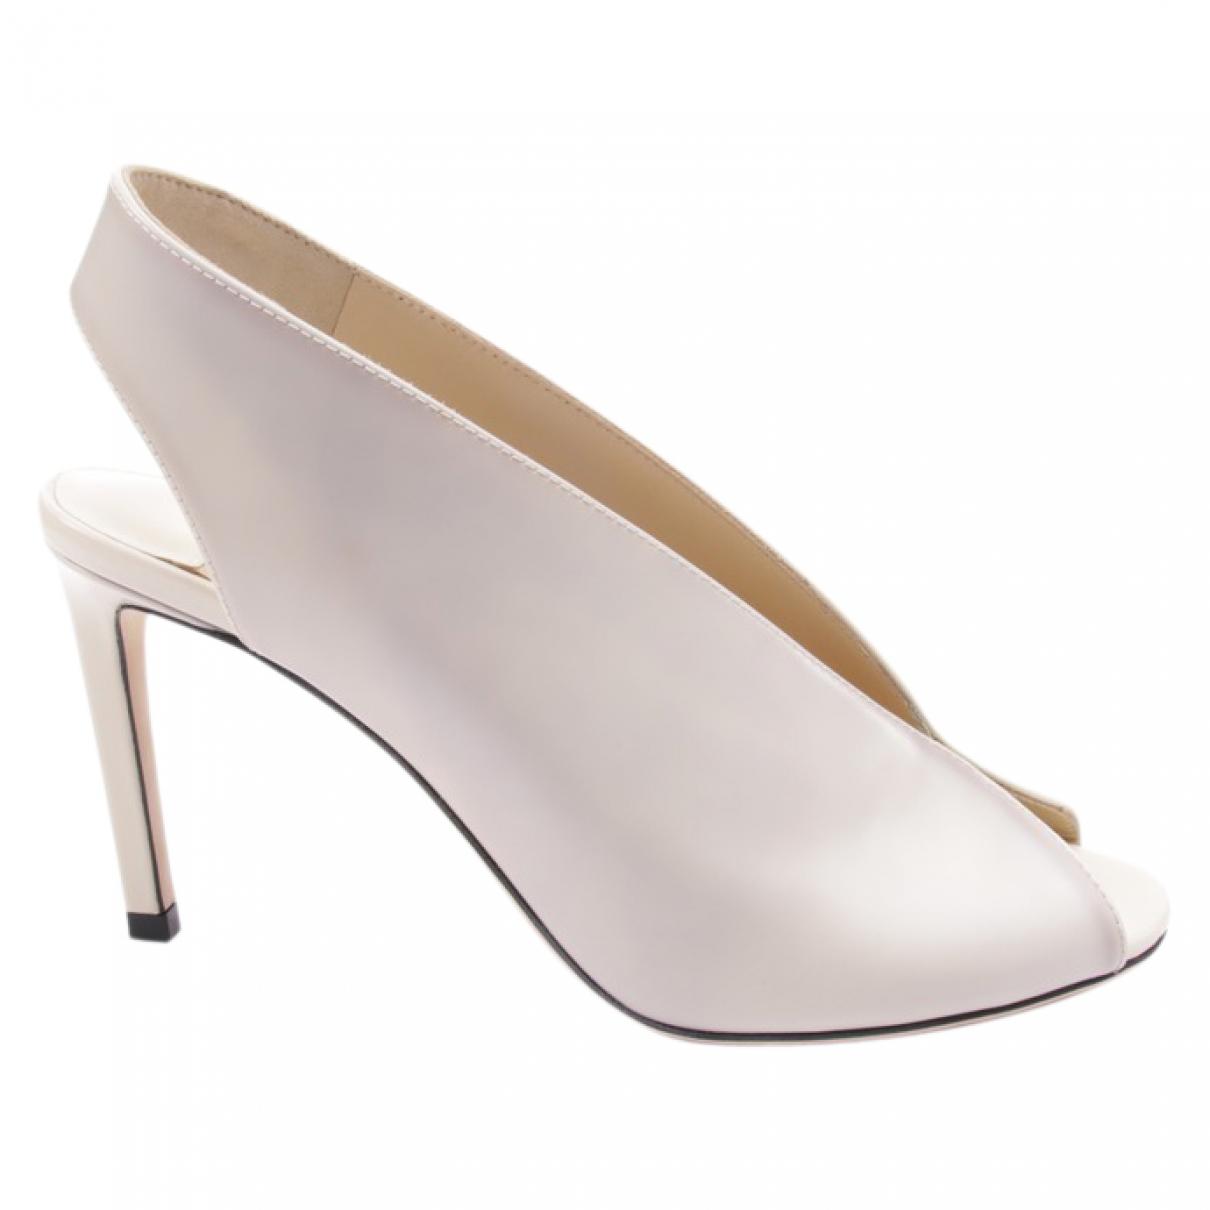 Jimmy Choo - Sandales   pour femme en cuir - blanc